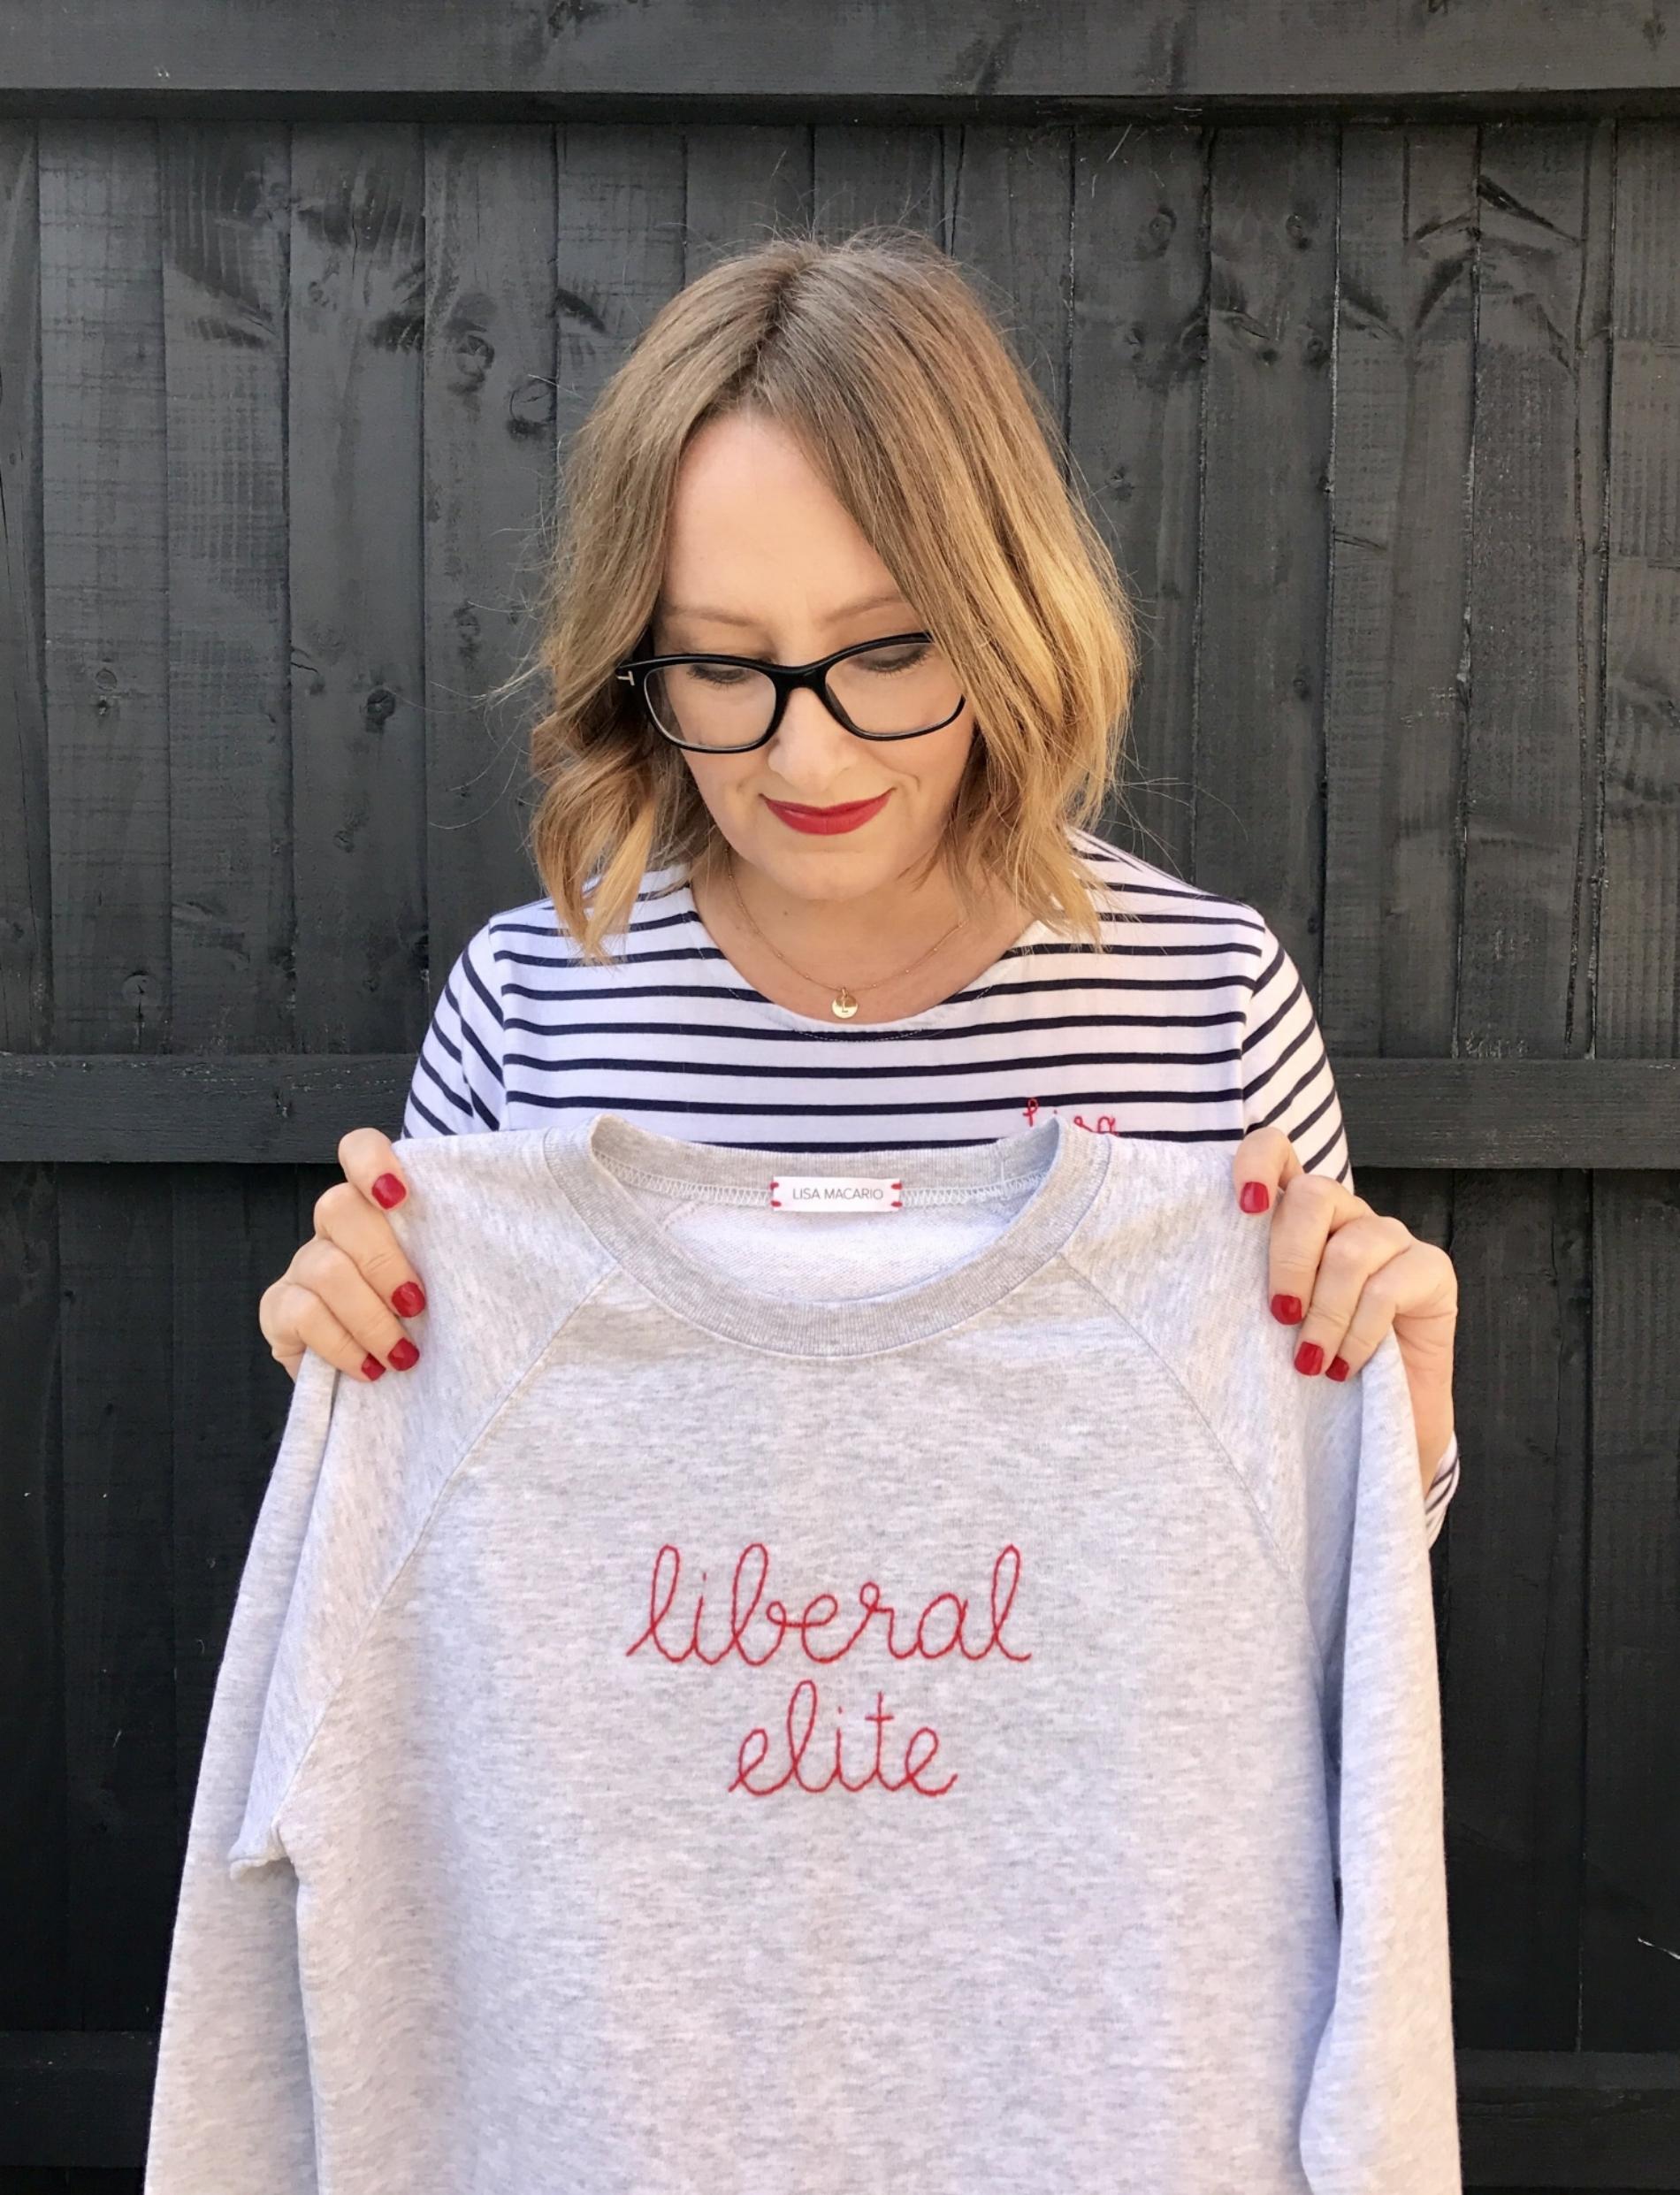 Lisa Macario liberal elite sweatshirt